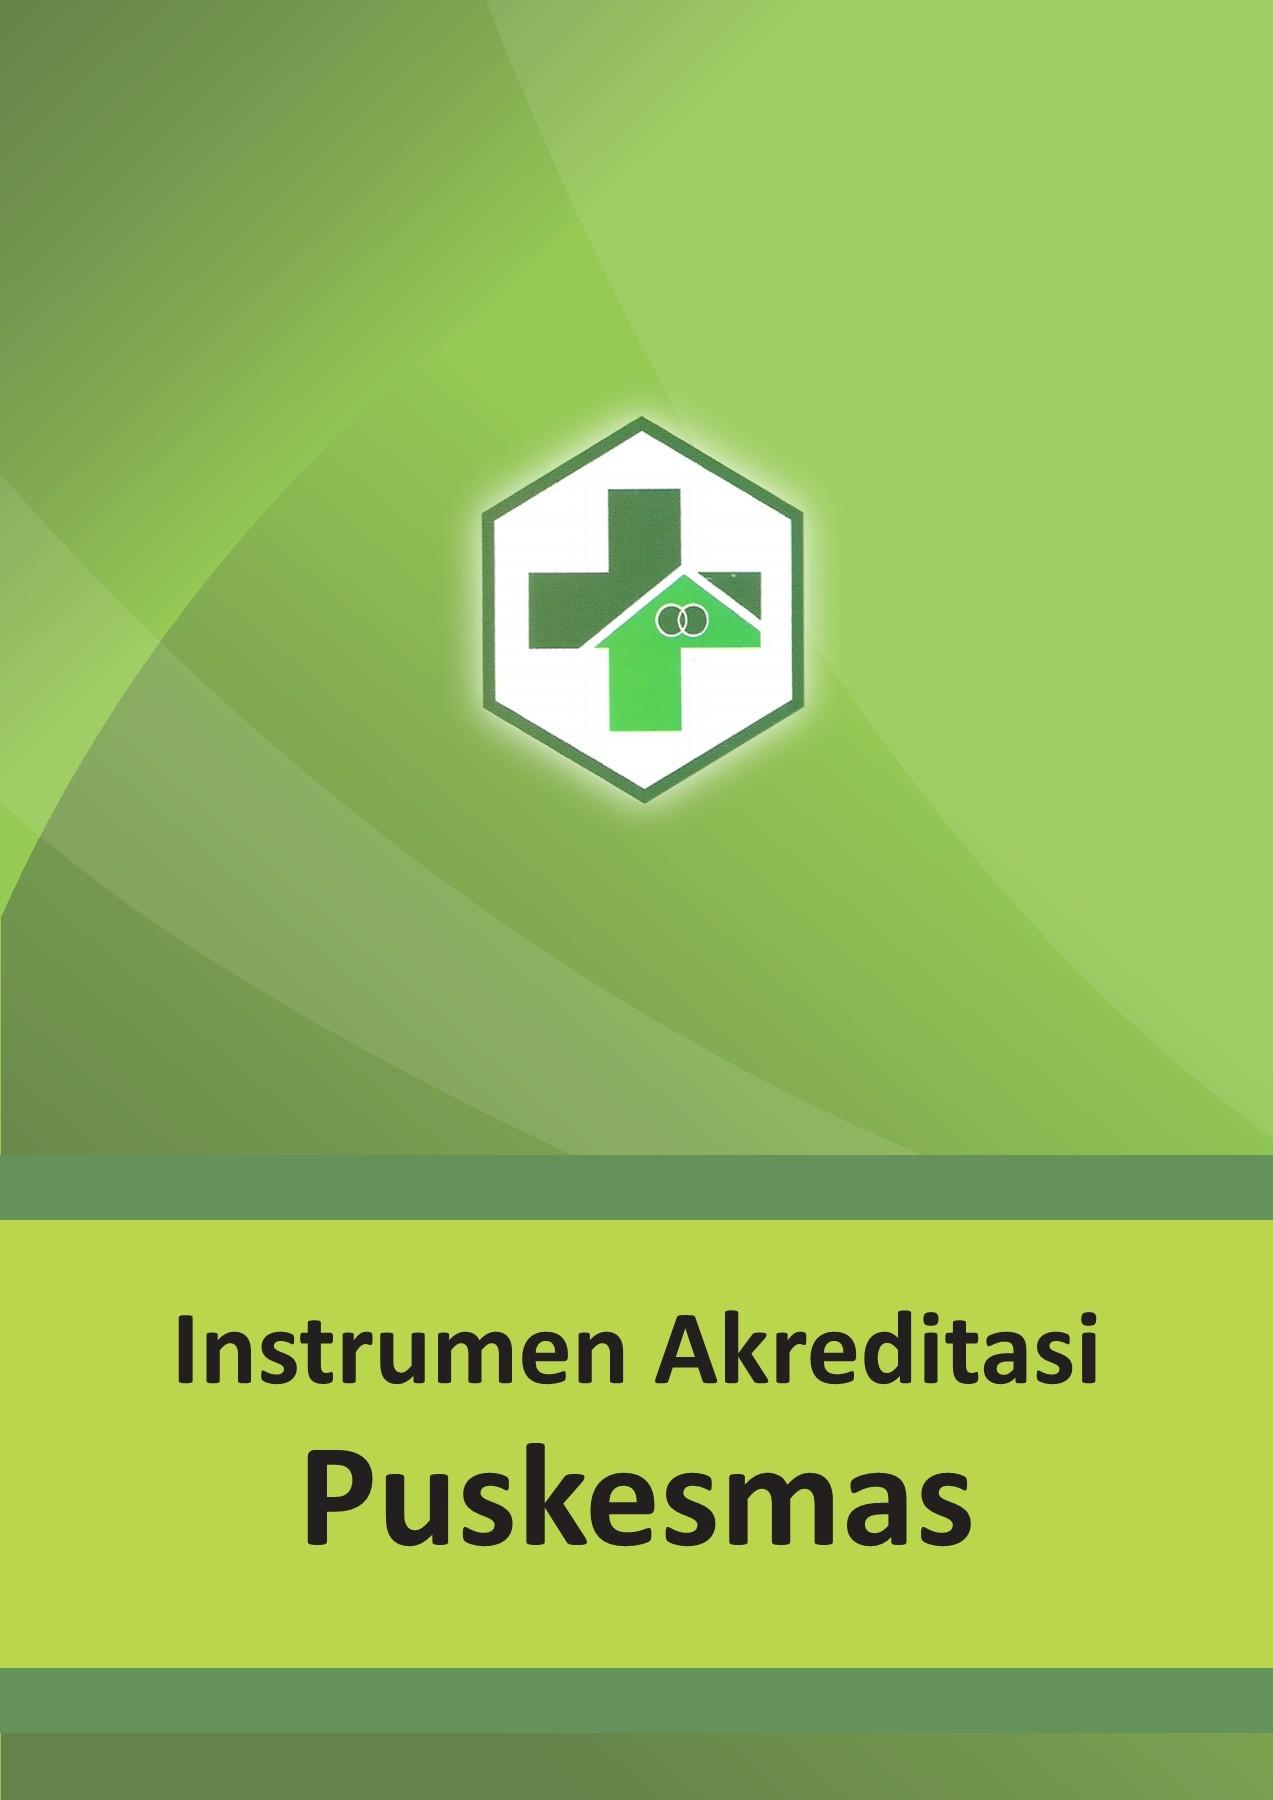 Logo Akreditasi Puskesmas : akreditasi, puskesmas, Akreditasi, Puskesmas